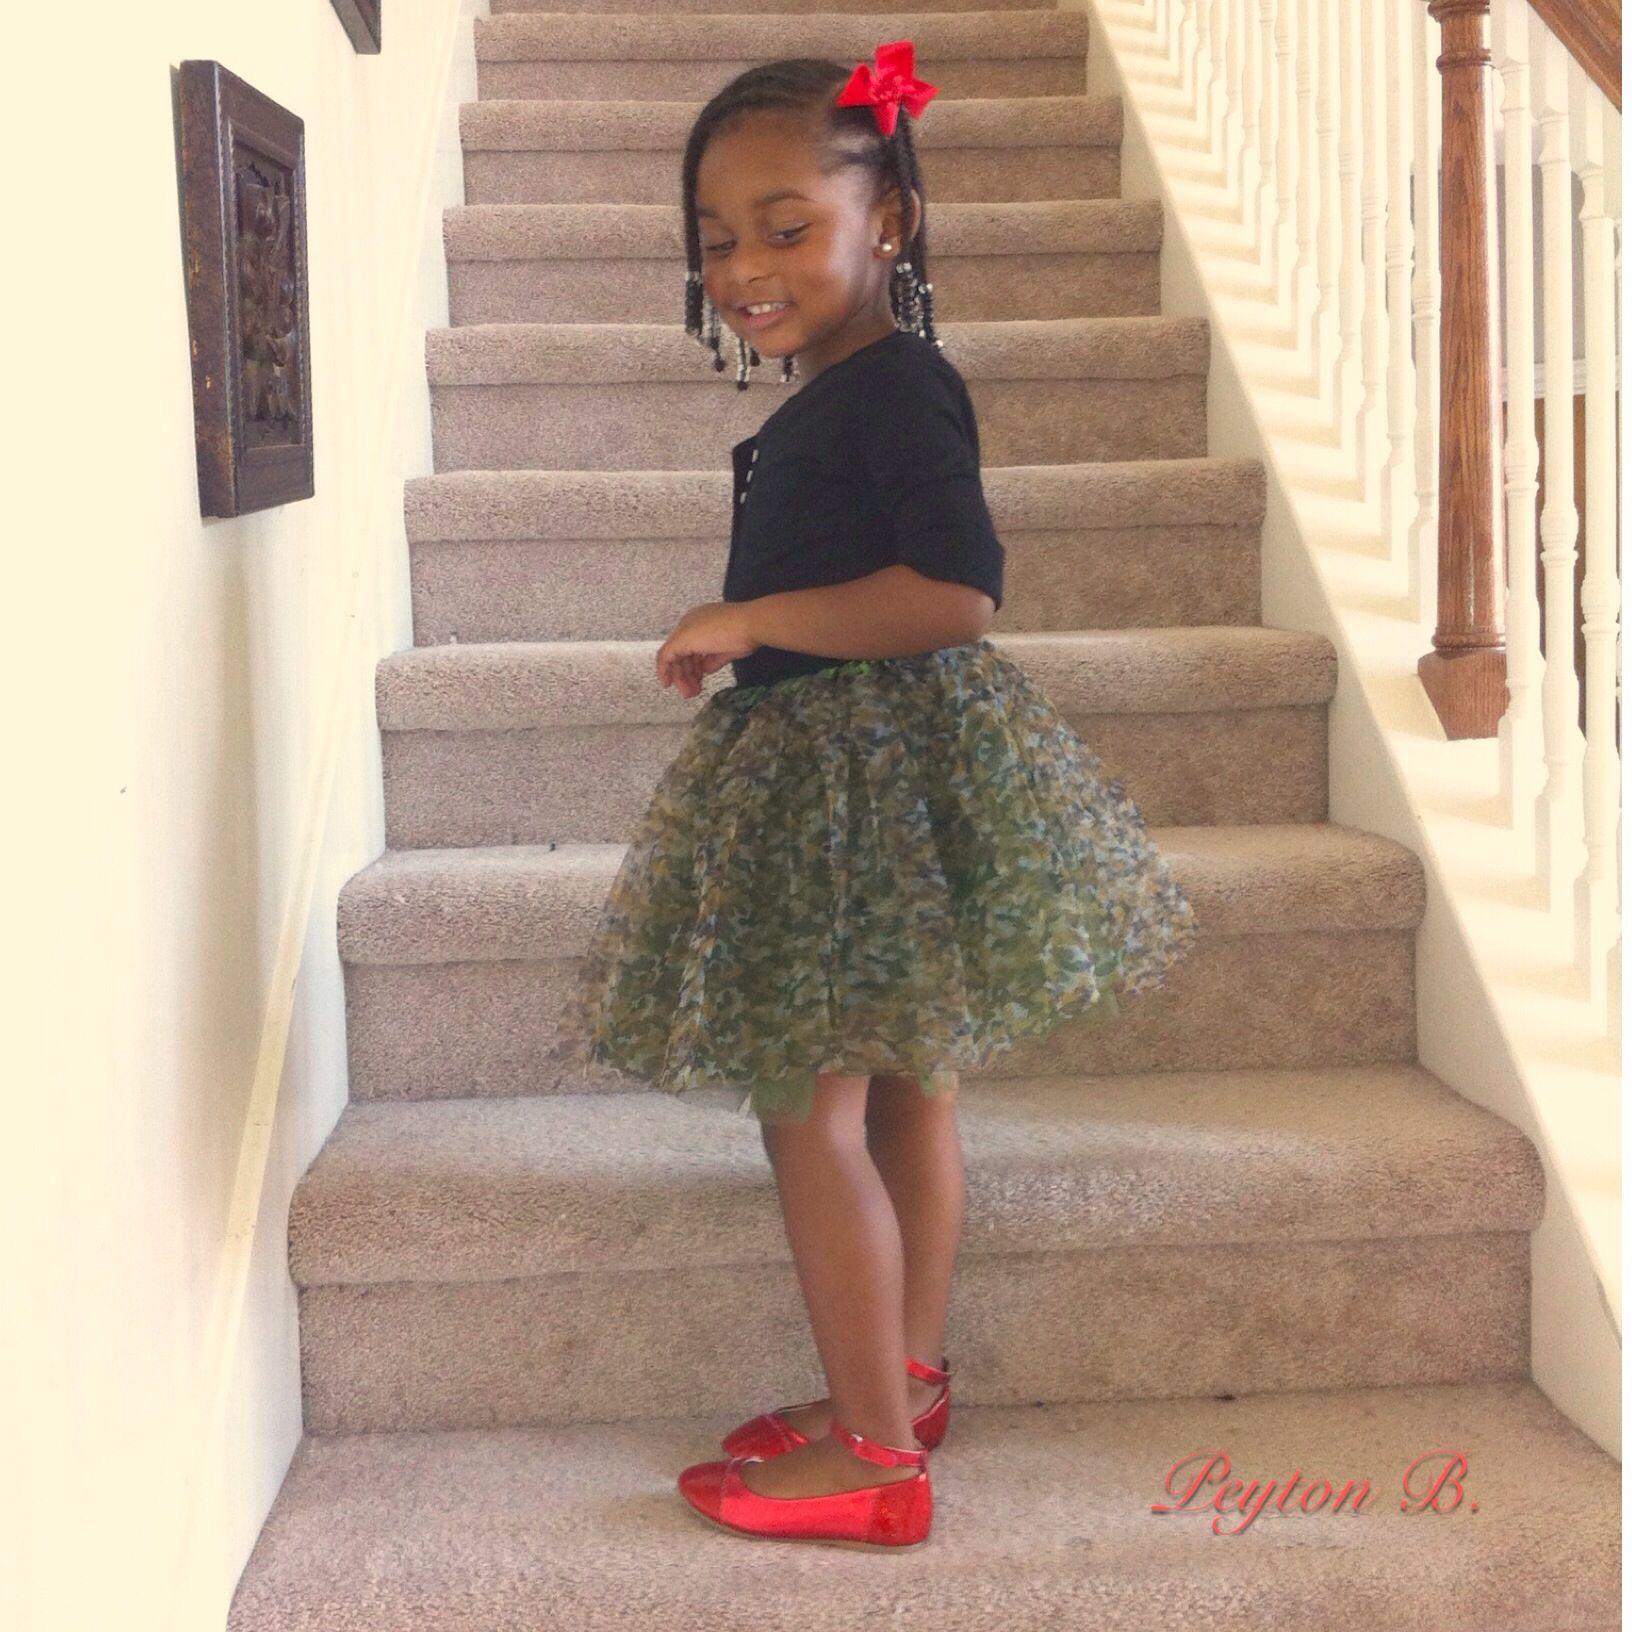 Top Tar Skirt Amazon Shoes Old Navy Kids Fashion Toddler